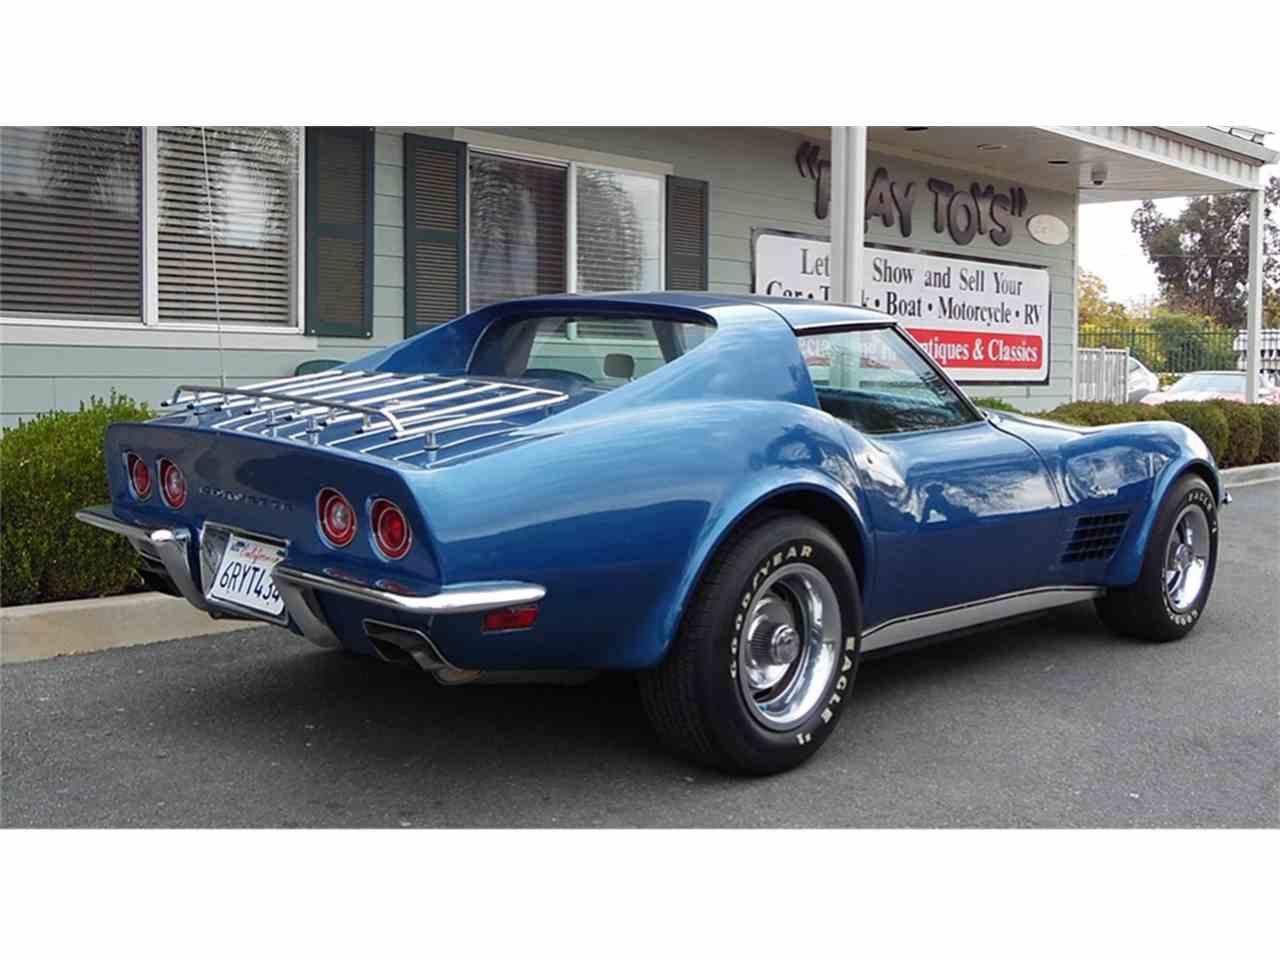 Corvette 1970 chevrolet corvette stingray : 1970 Chevrolet Corvette for Sale   ClassicCars.com   CC-1042193